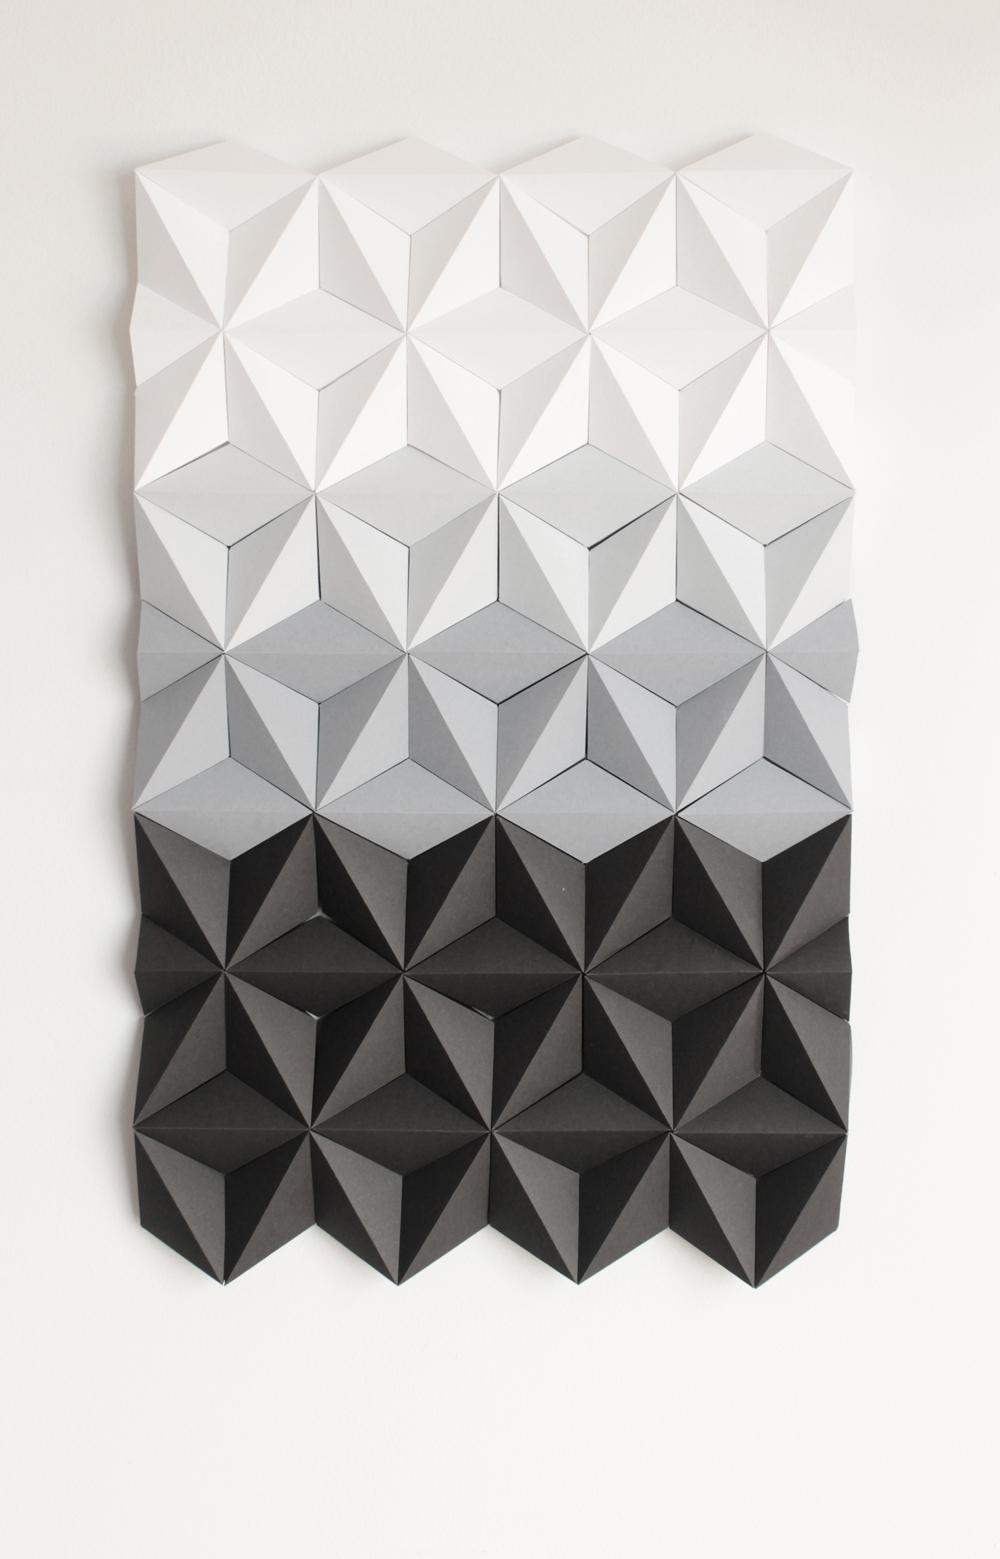 02 White to Black 64x40_web.jpg